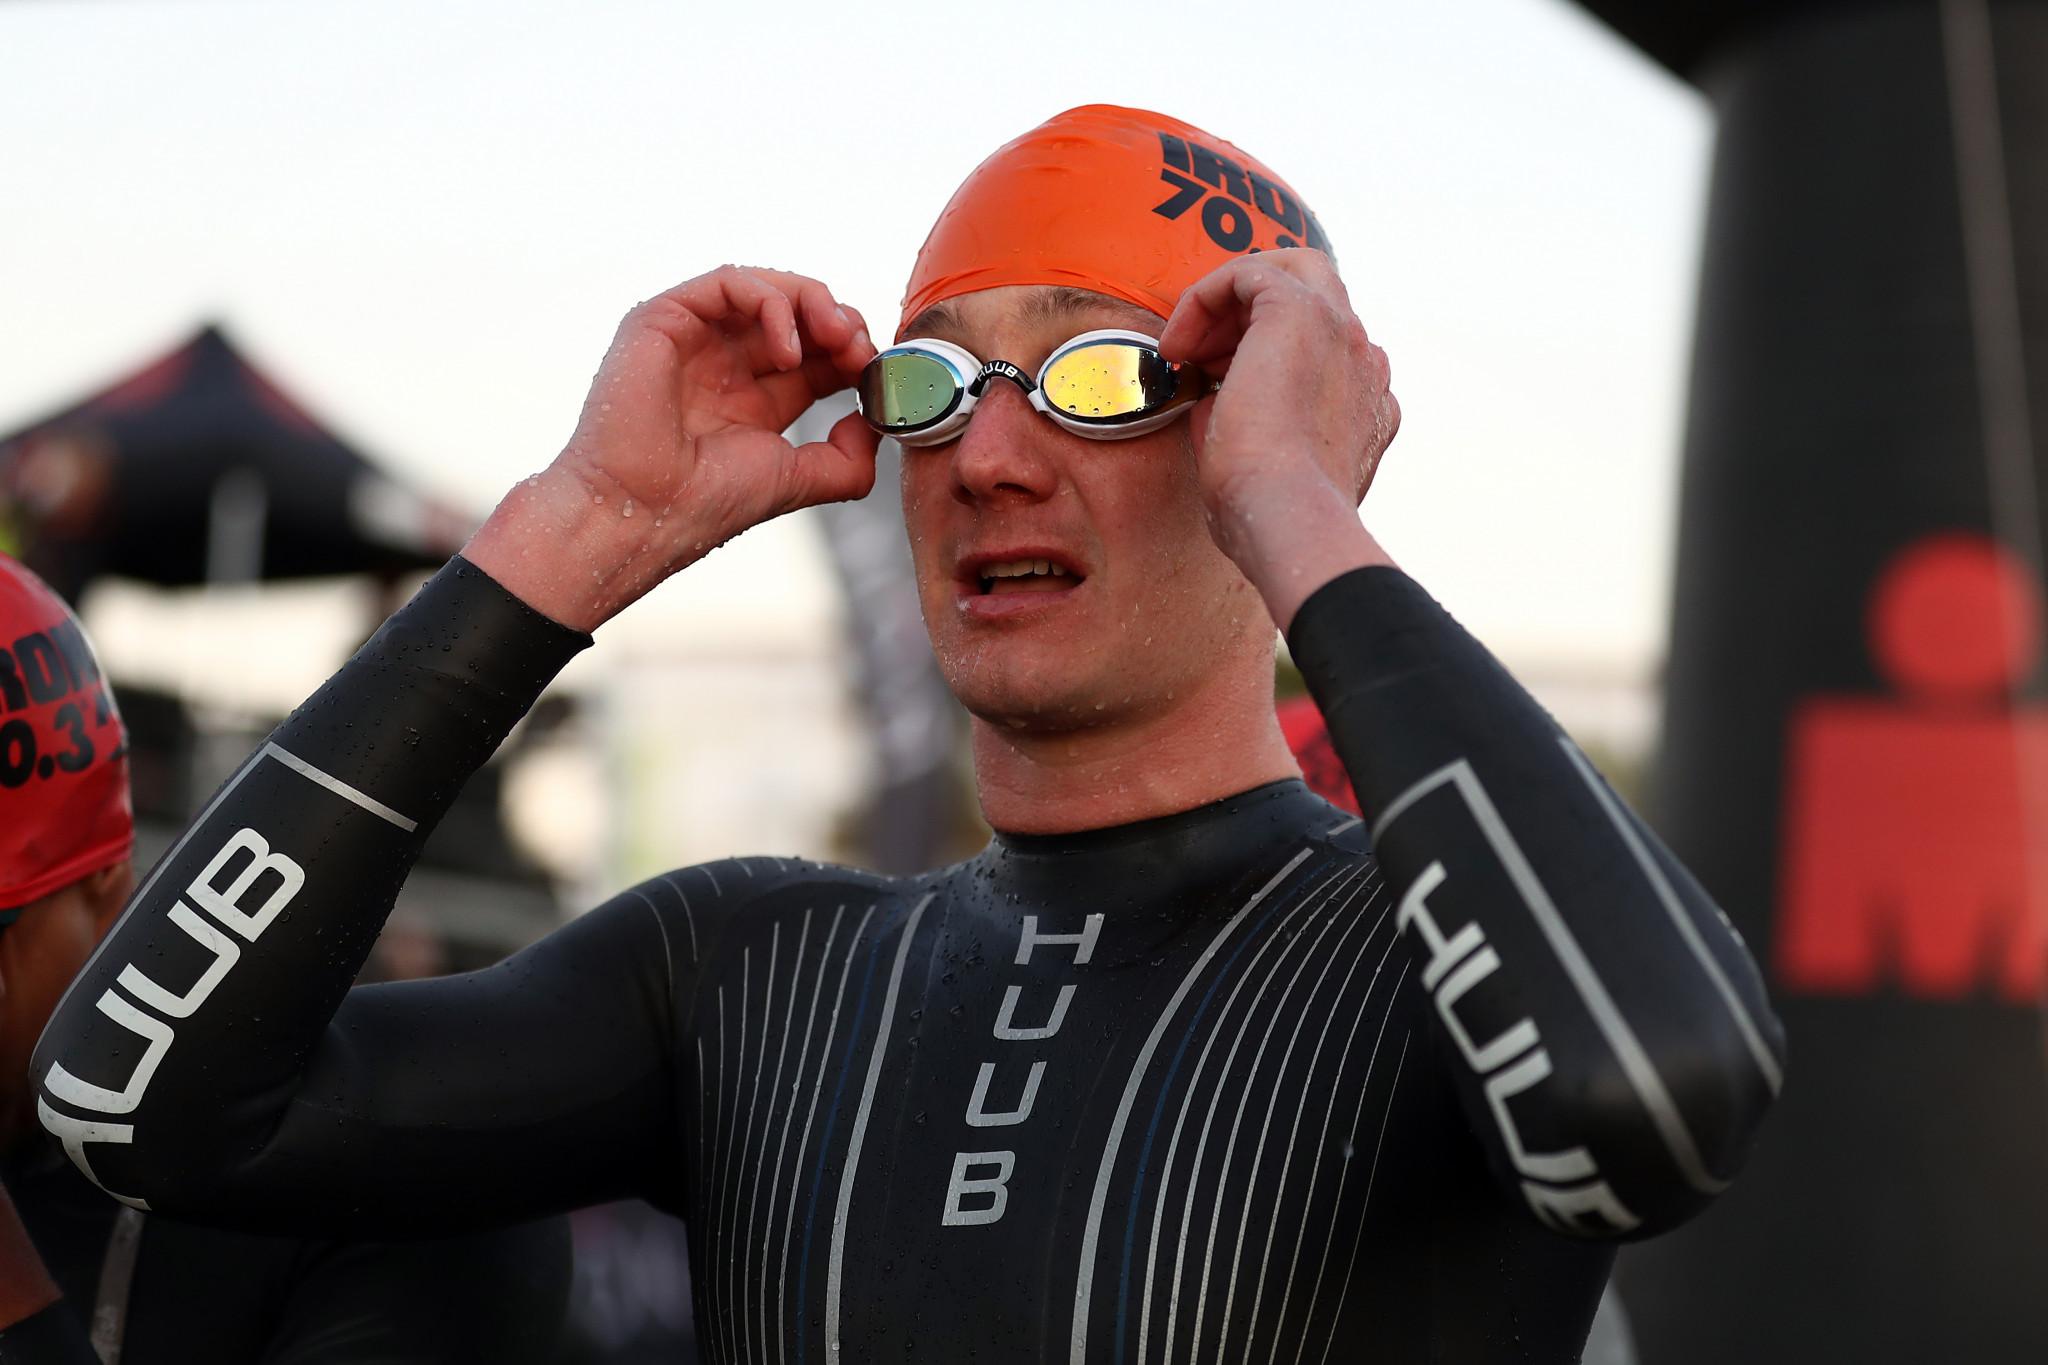 Brownlee blitzes the field in Triathlon European Championships in Weert to complete British double